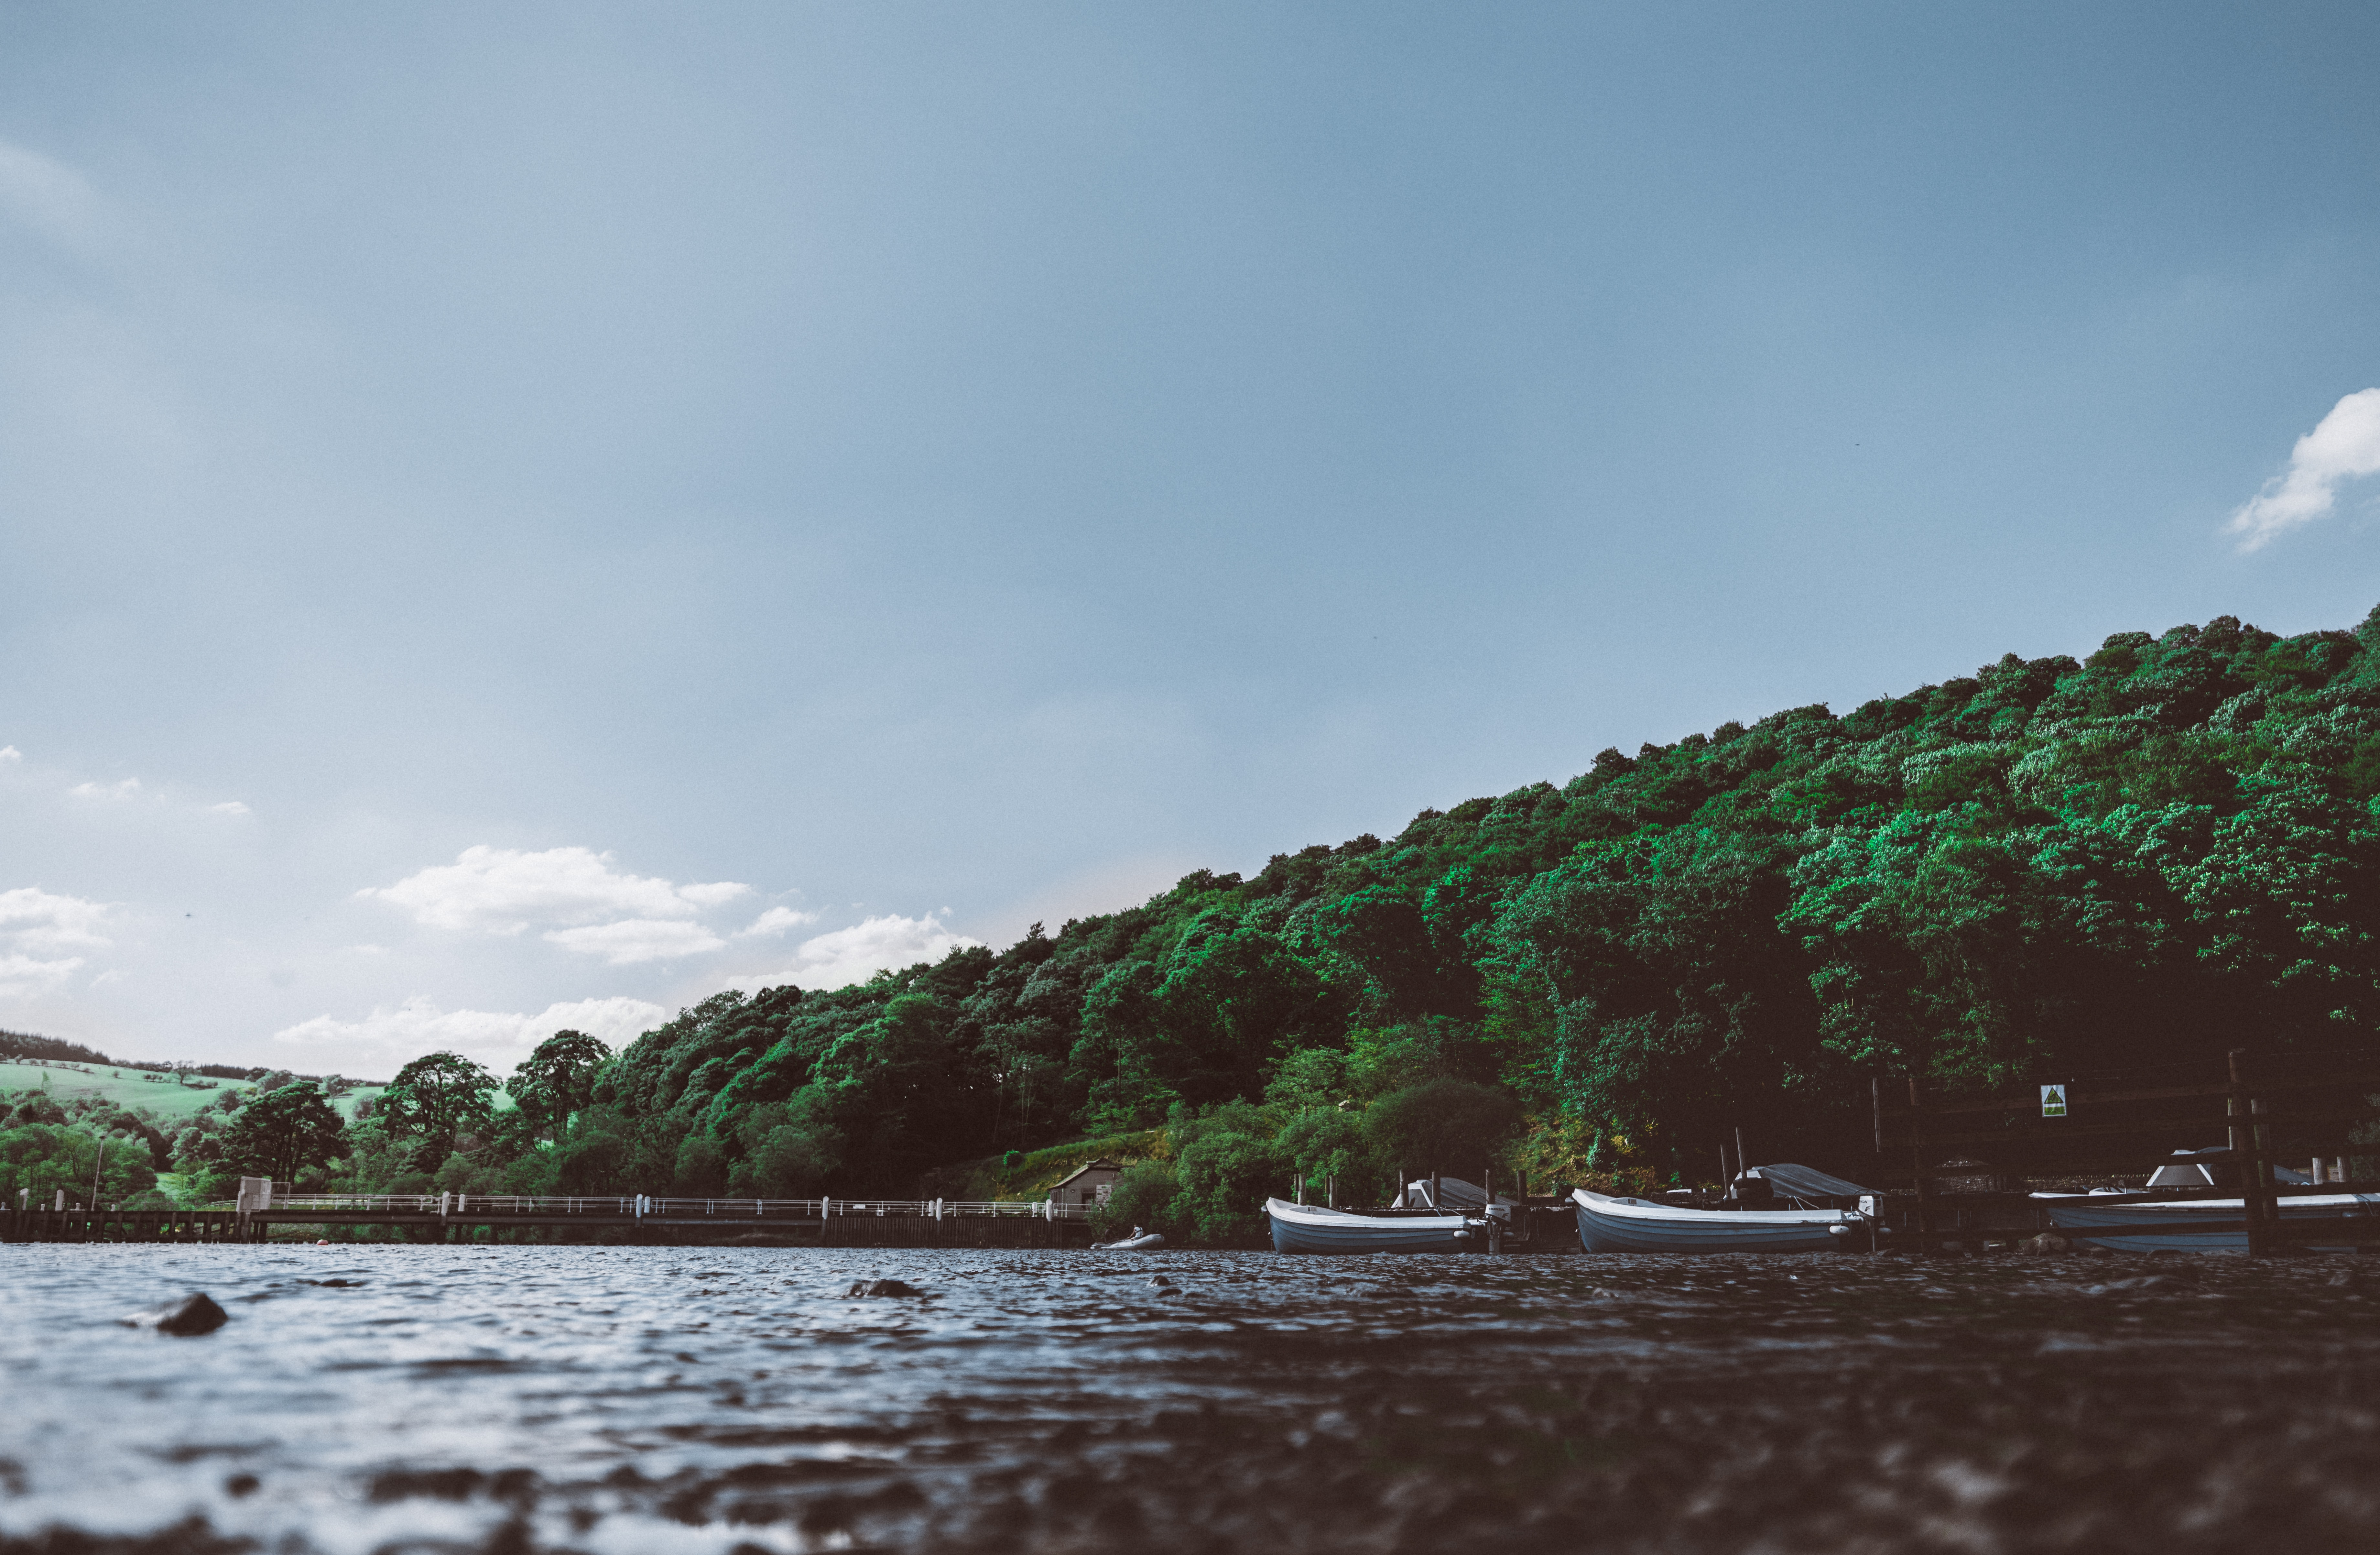 Boats moored at the shore of a choppy lake